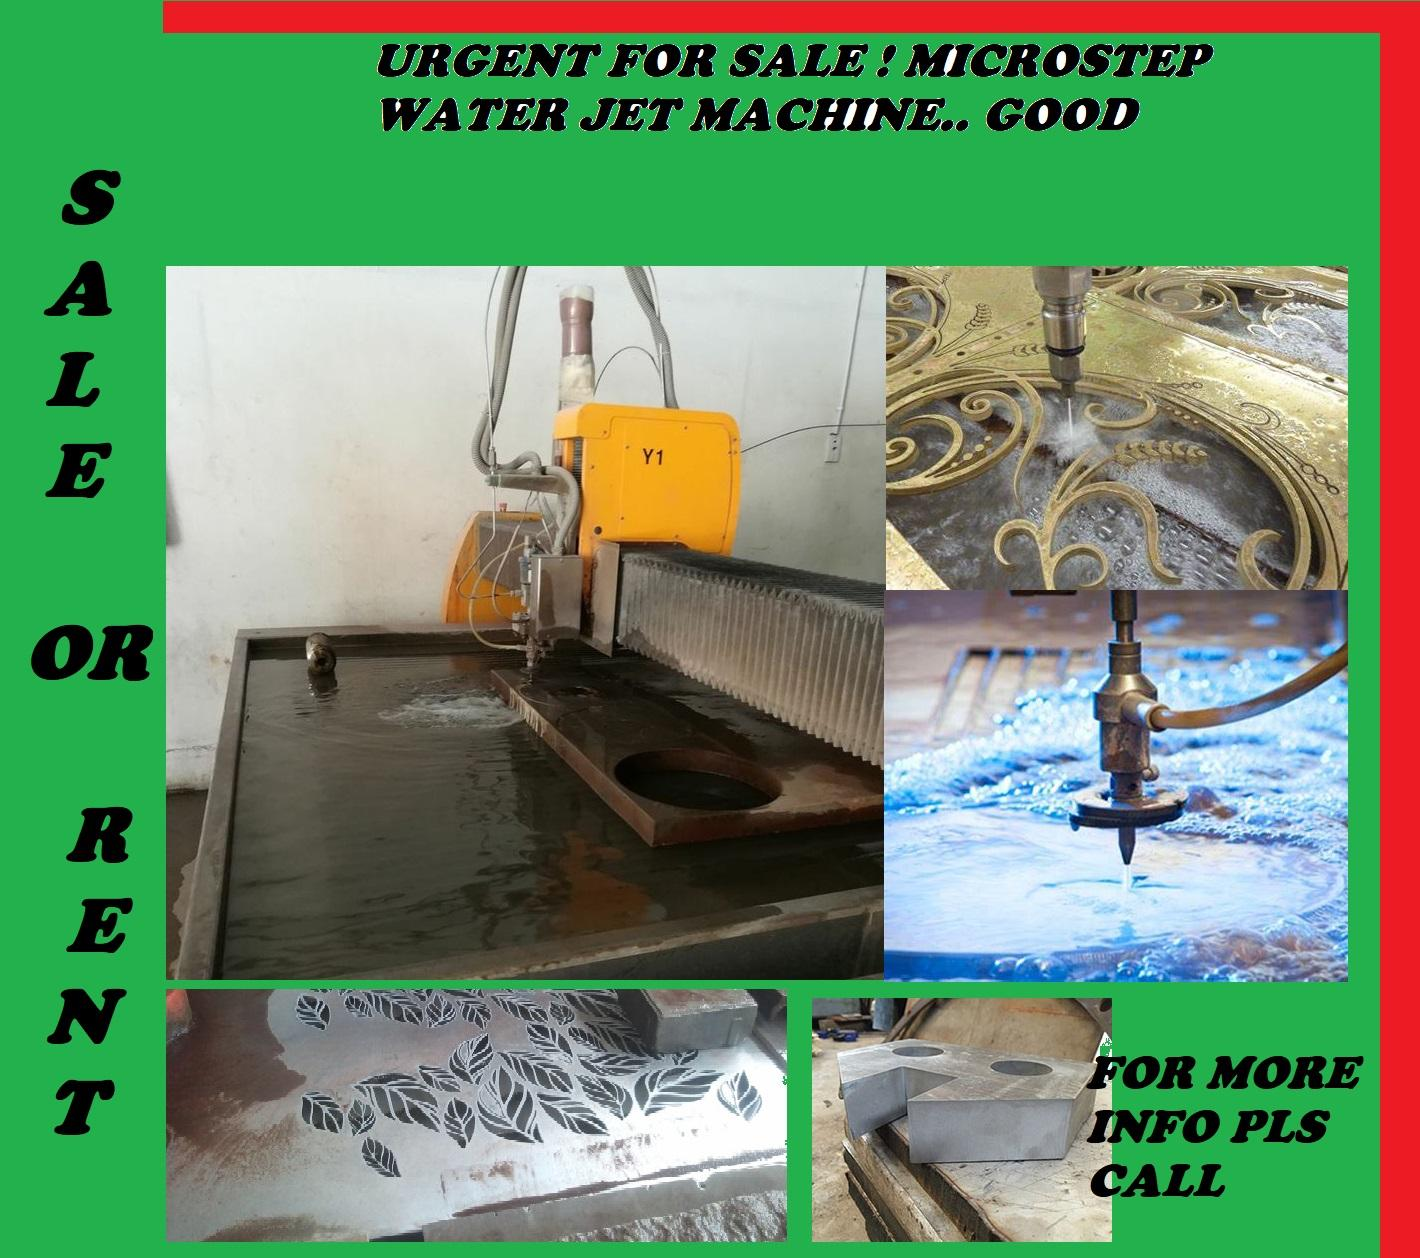 WATER JET MACHINE MICRO STEP! URGENT FOR SALE!!